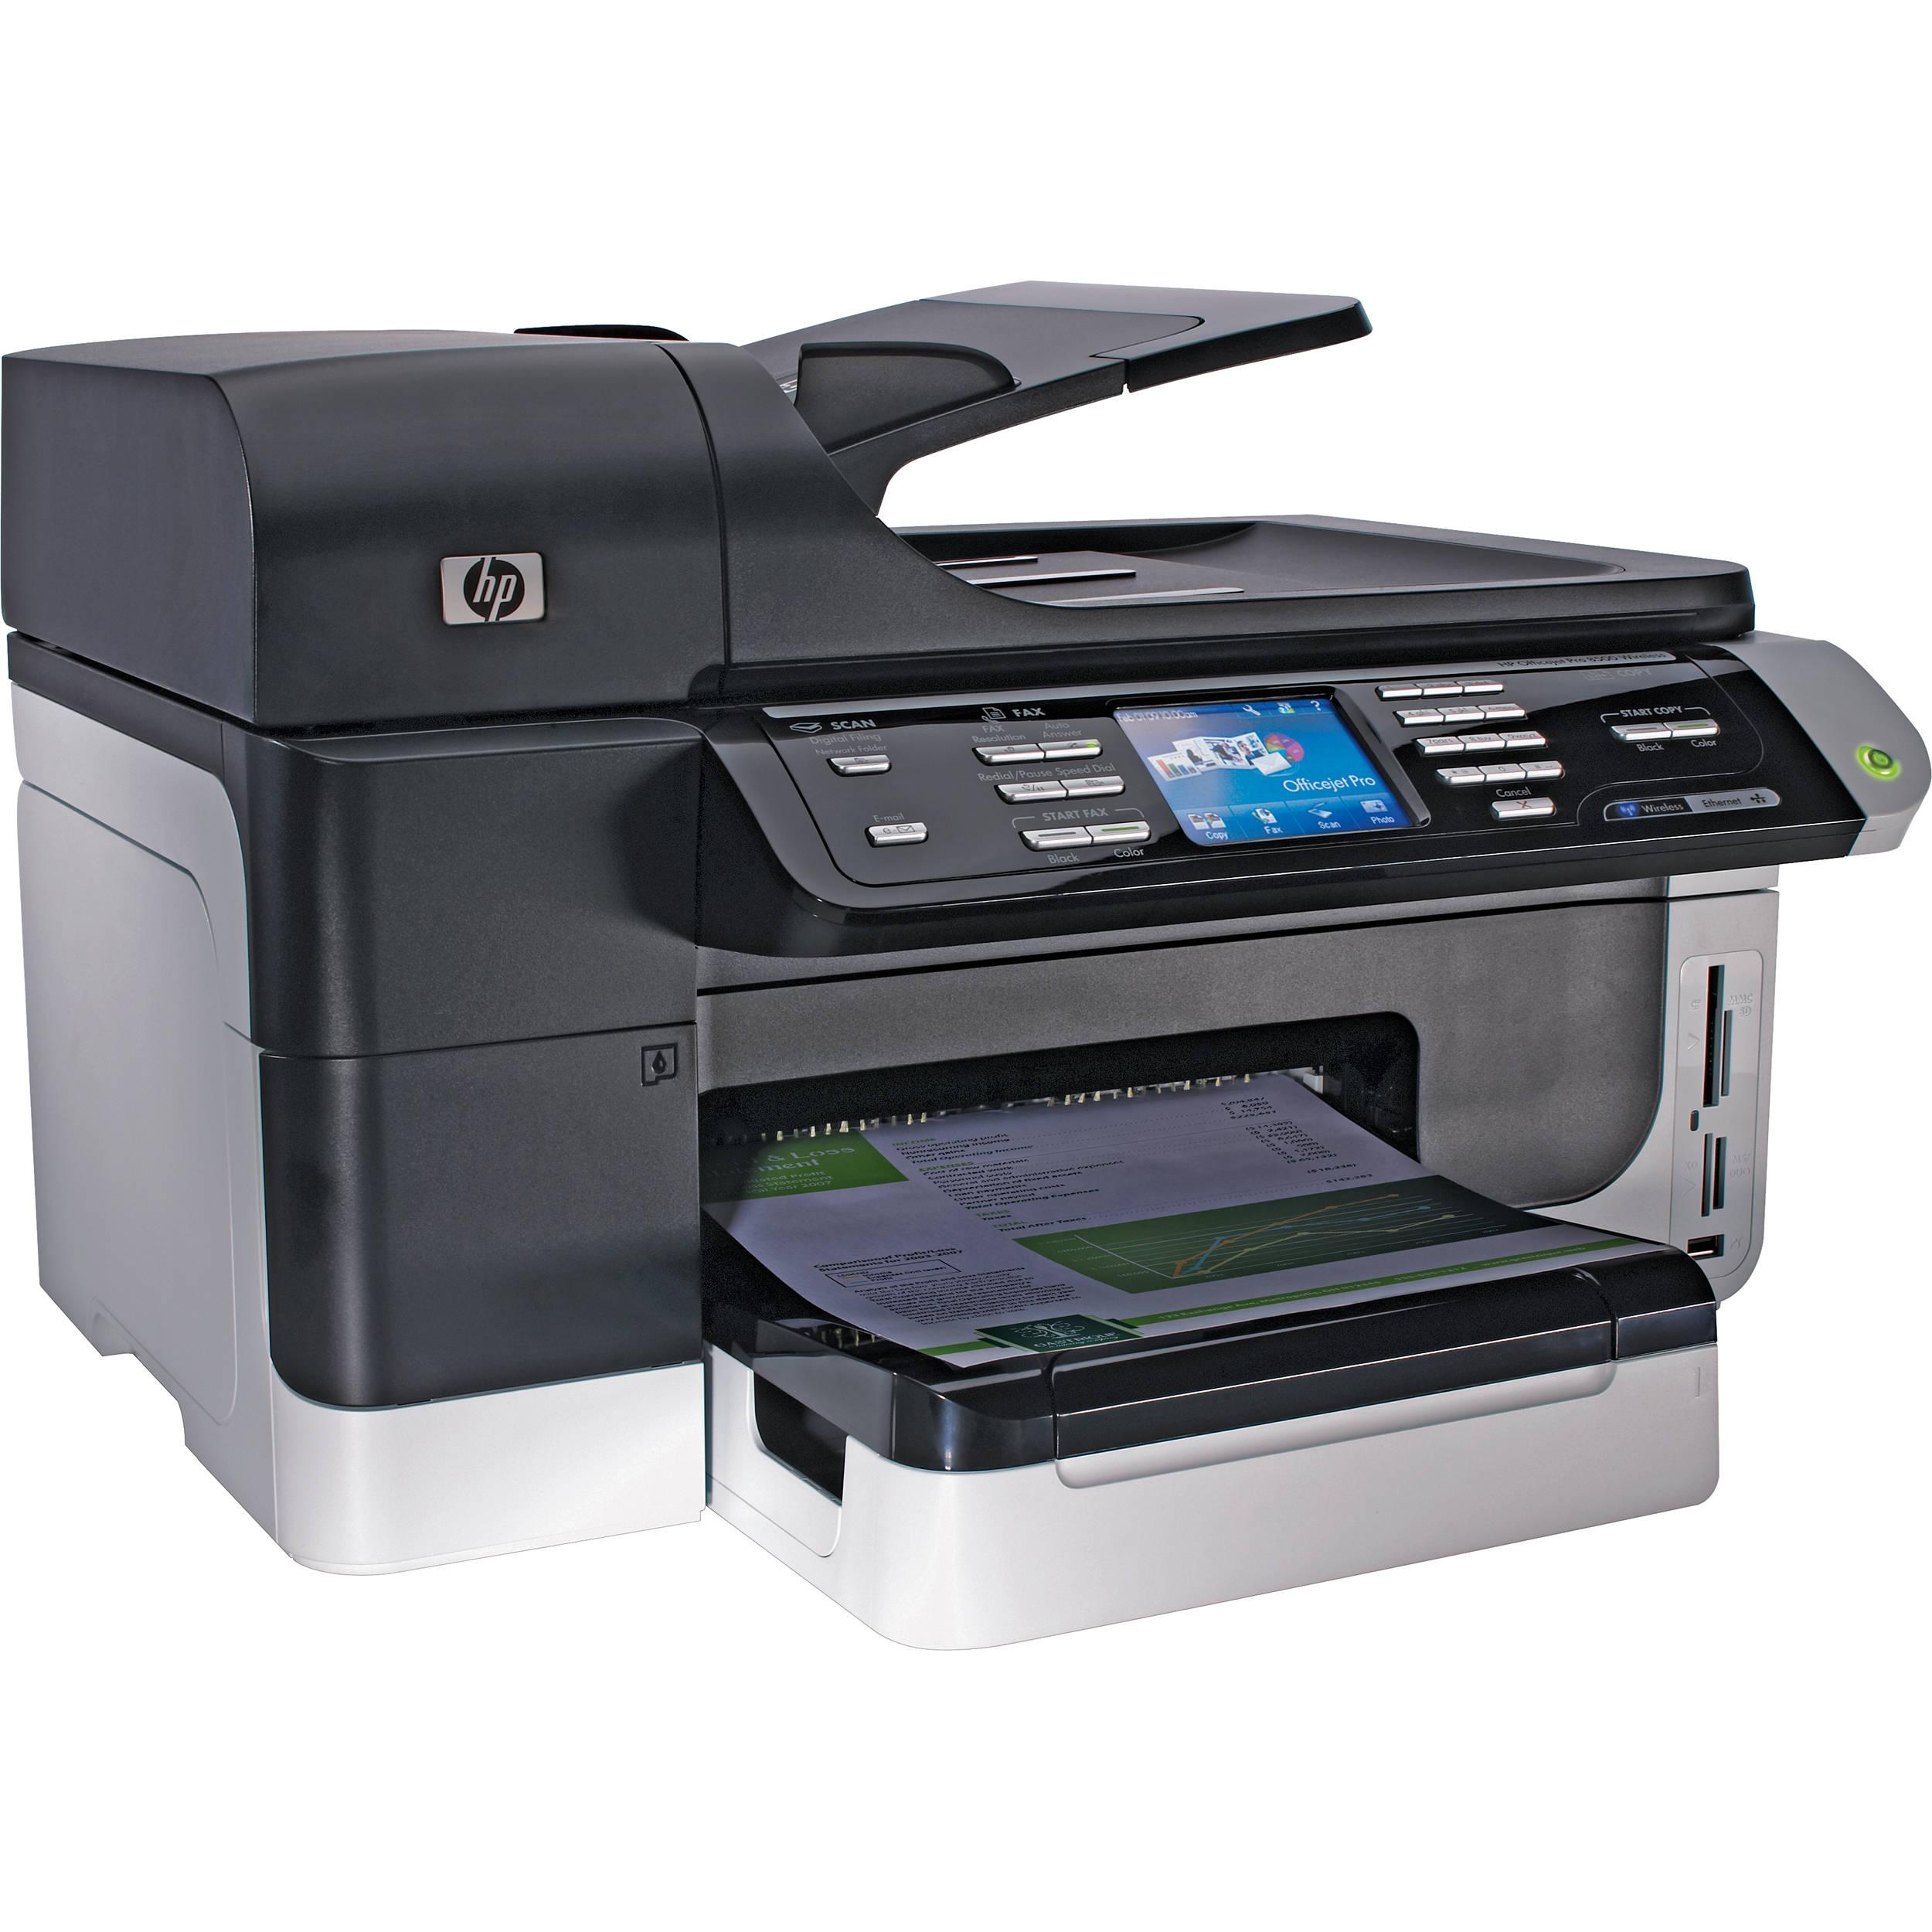 HP Officejet Pro 8500 Wireless All-in-One Printer CB023A